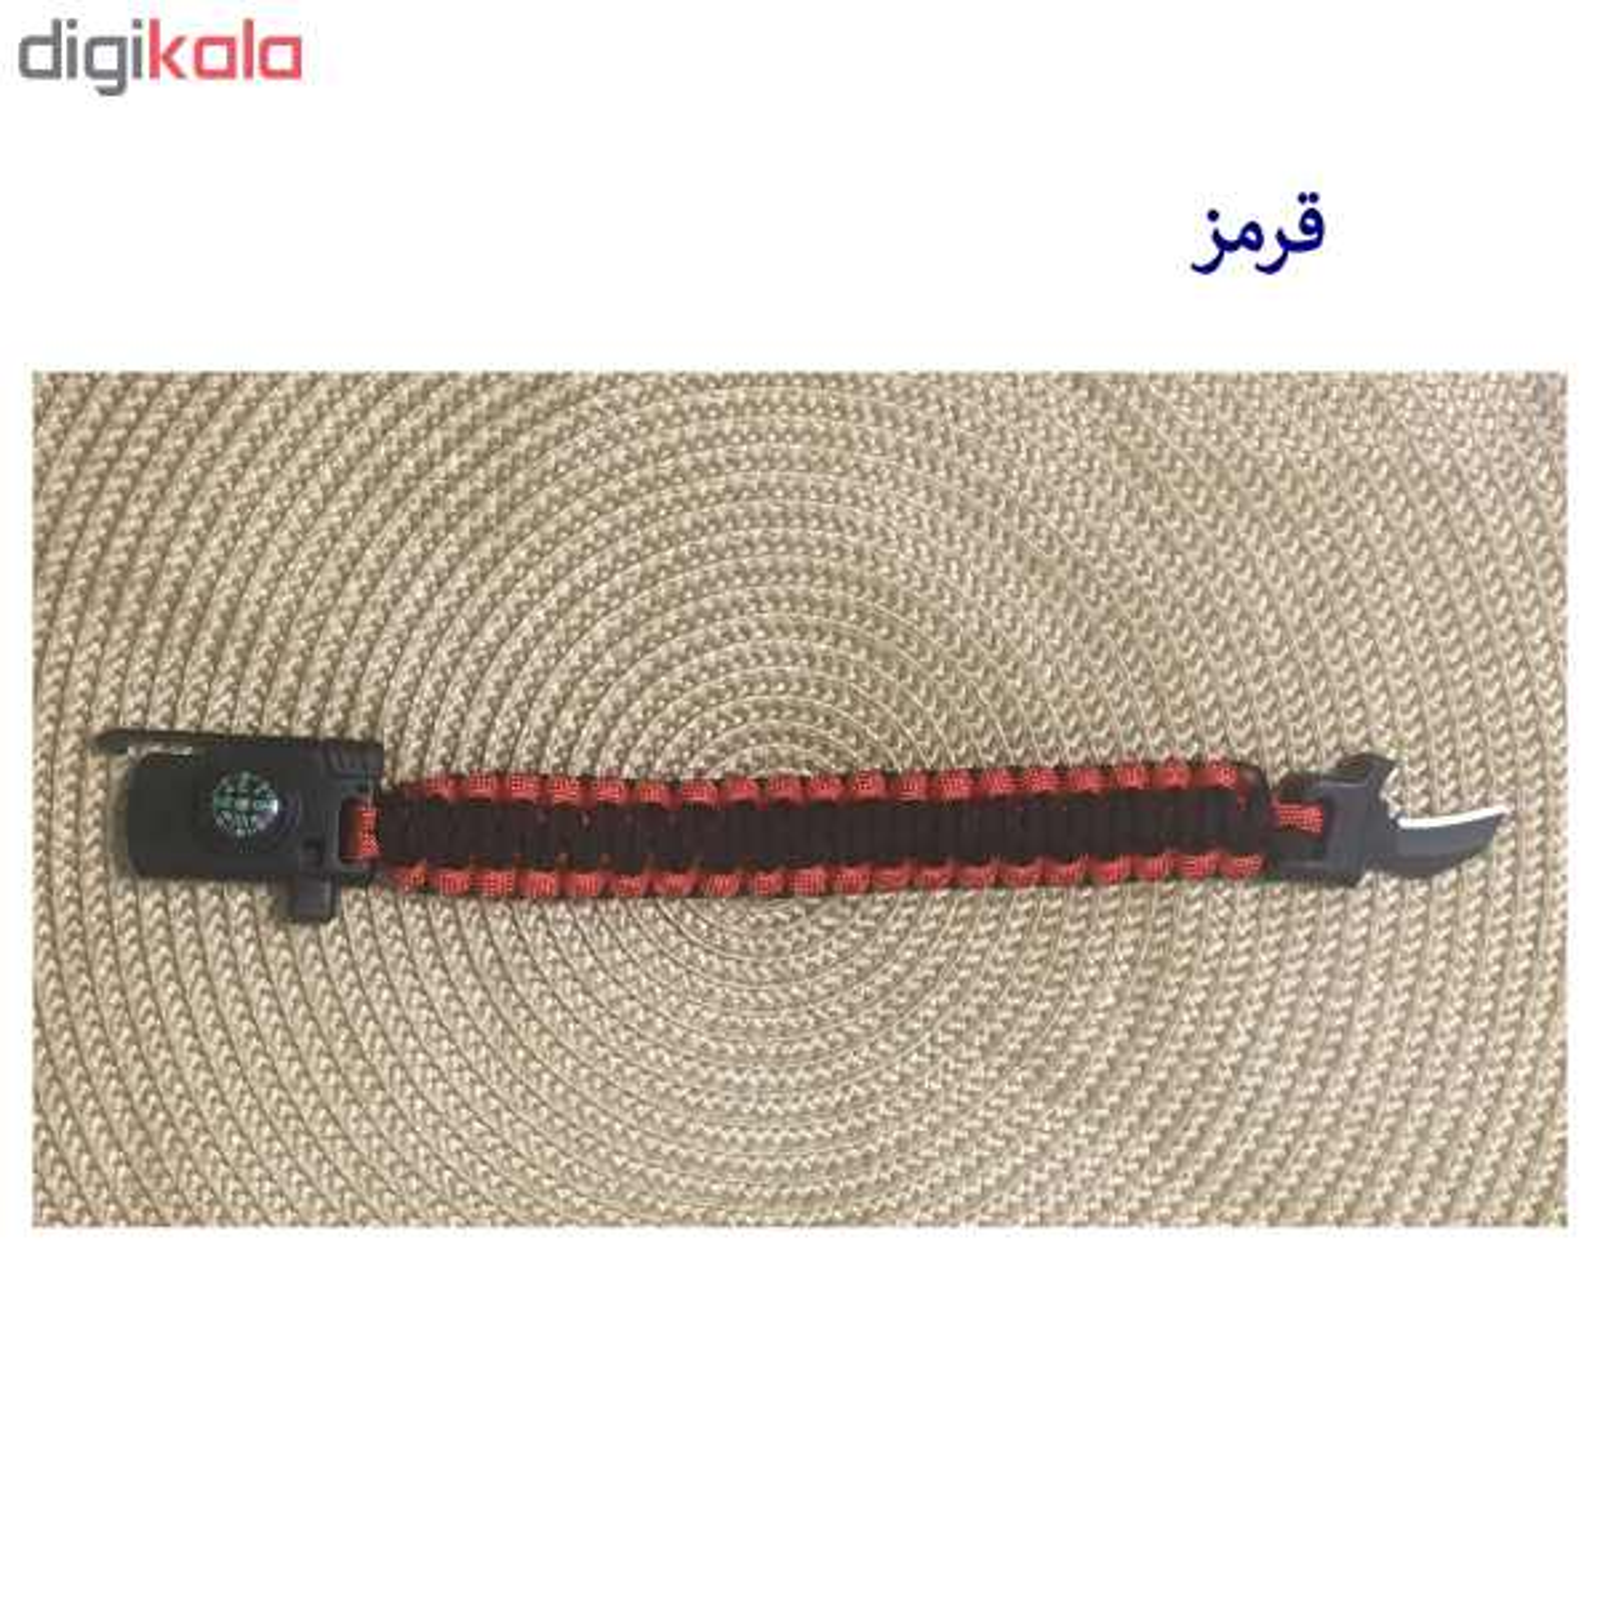 دستبند پاراکورد مدل Tactical 2 main 1 7